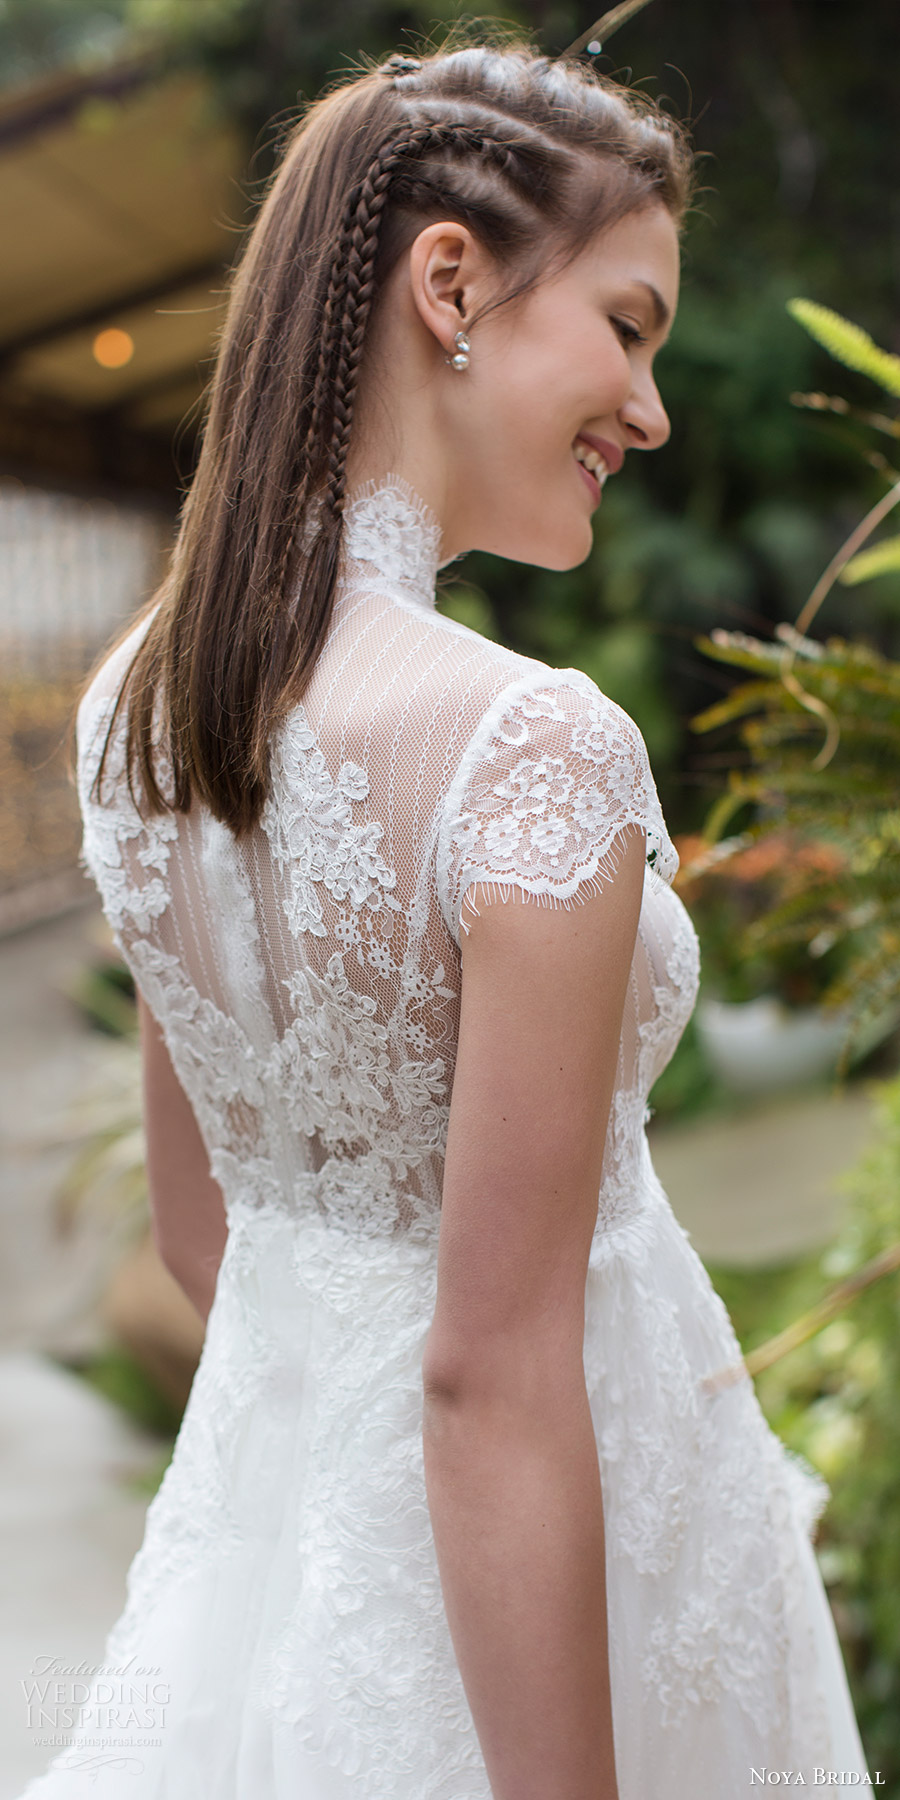 noya bridal 2016 cap sleeves illusion high neckline aline empire waist wedding dress (1203) zbv sheer back romantic